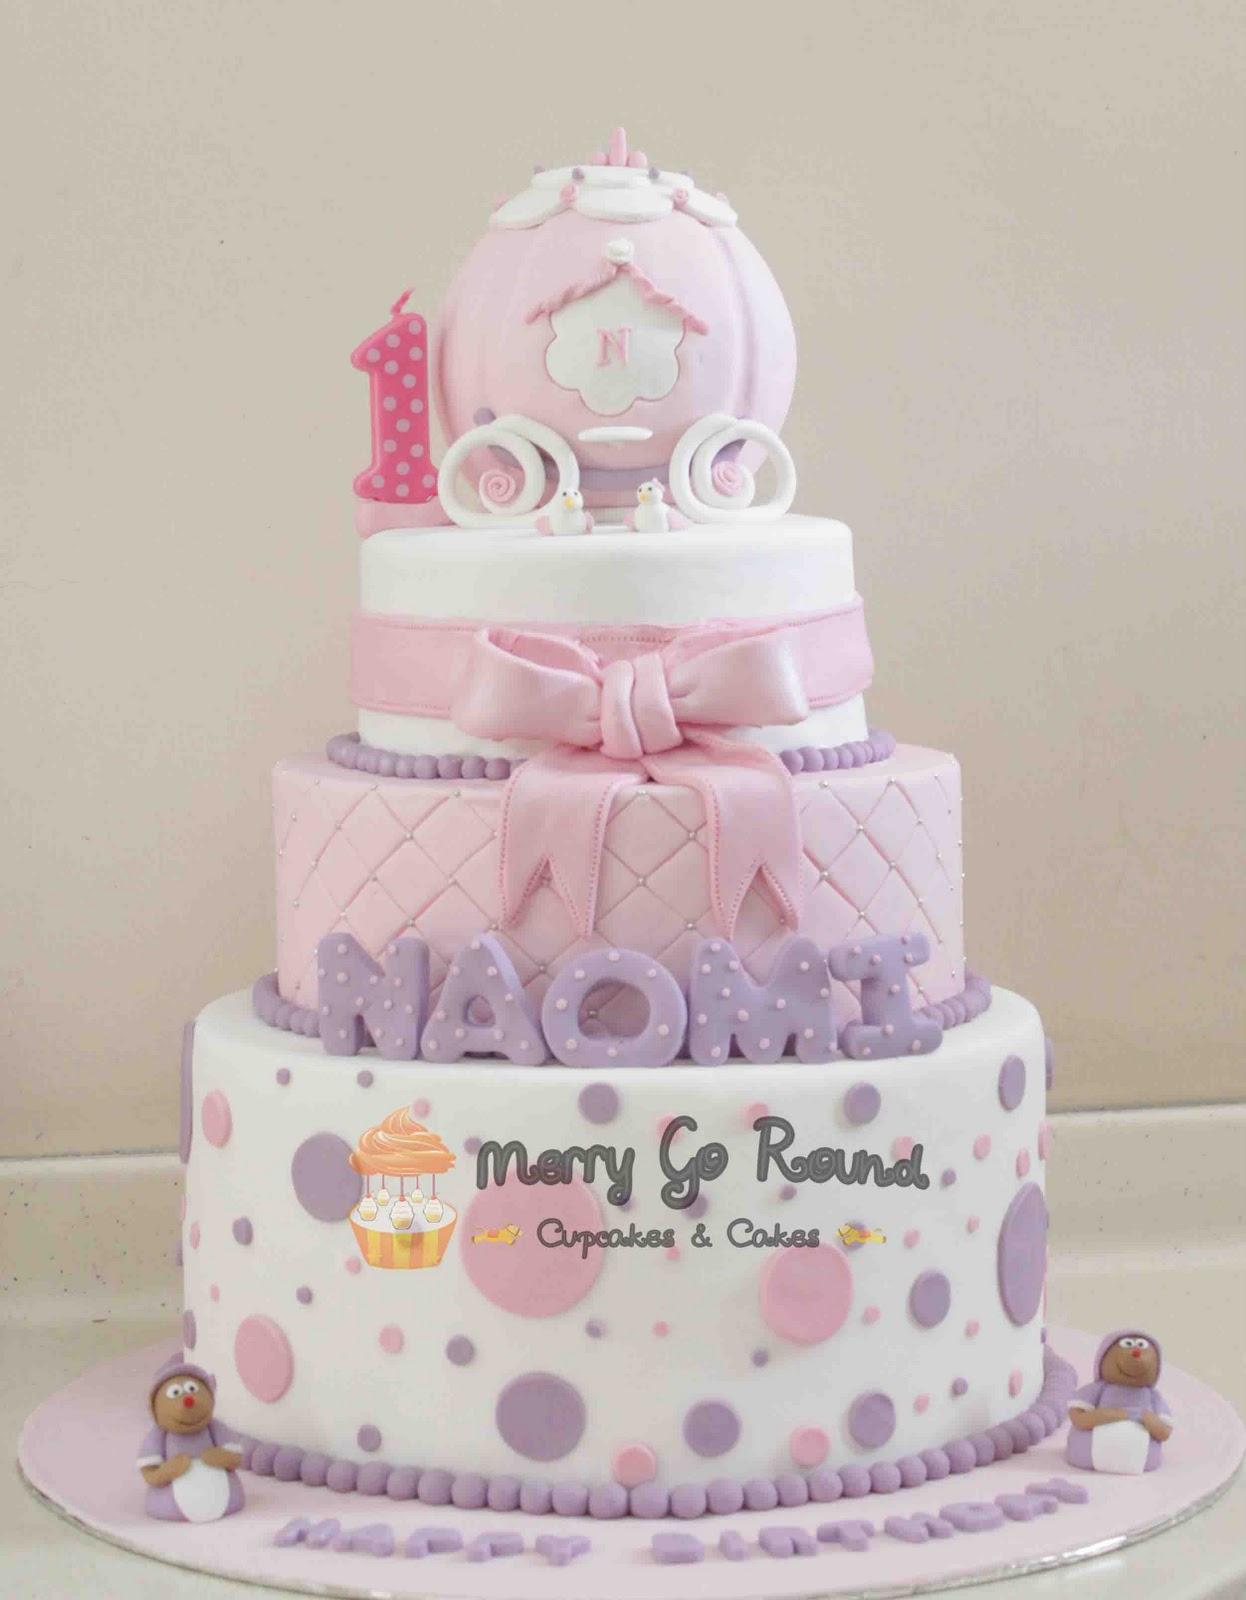 Merry Go Round Cupcakes Cakes Happy 1st Birthday Naomi